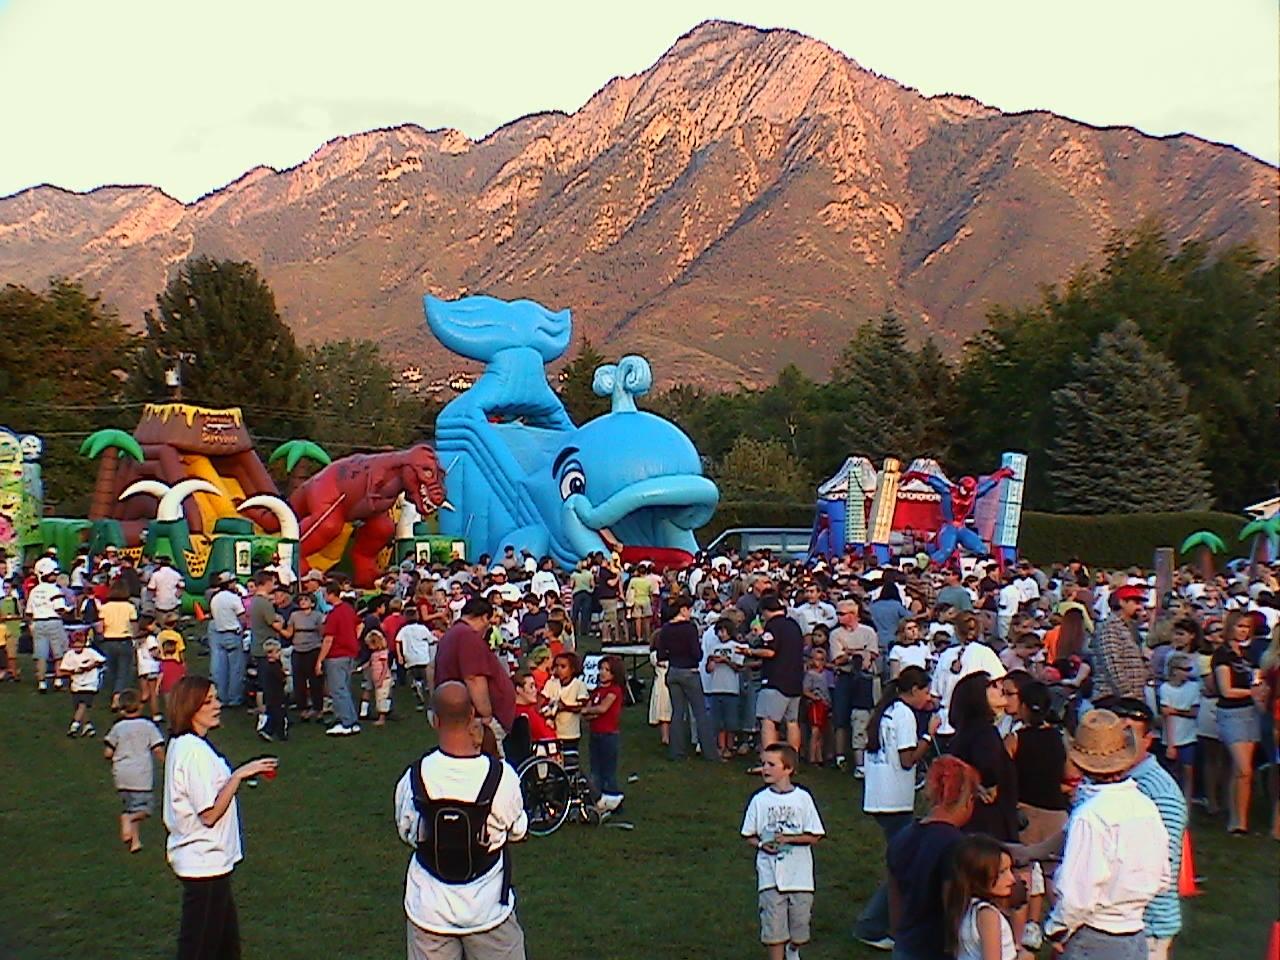 School Carnival In Utah. Lots of fun games & rides!